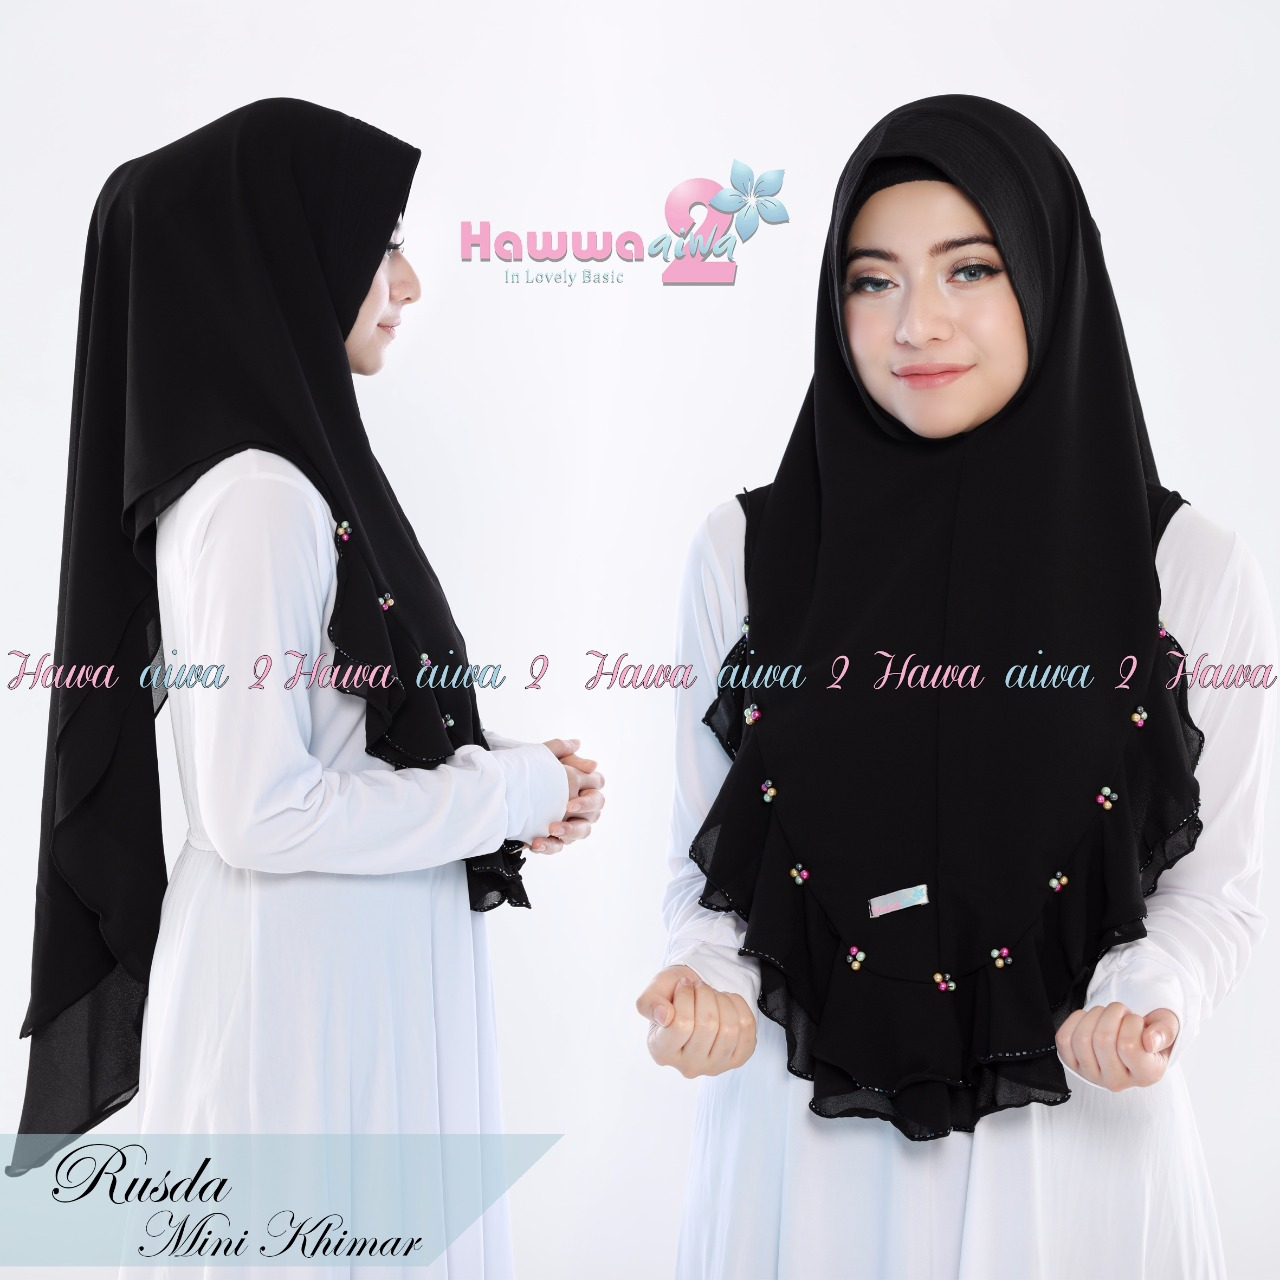 Jfashion Womens Tunik Long Sleeve Arumi Khaki Update Daftar Harga Etchnic Fashion Elegan Shareen Rusda Mini Khimar By Hawwa Aiwa